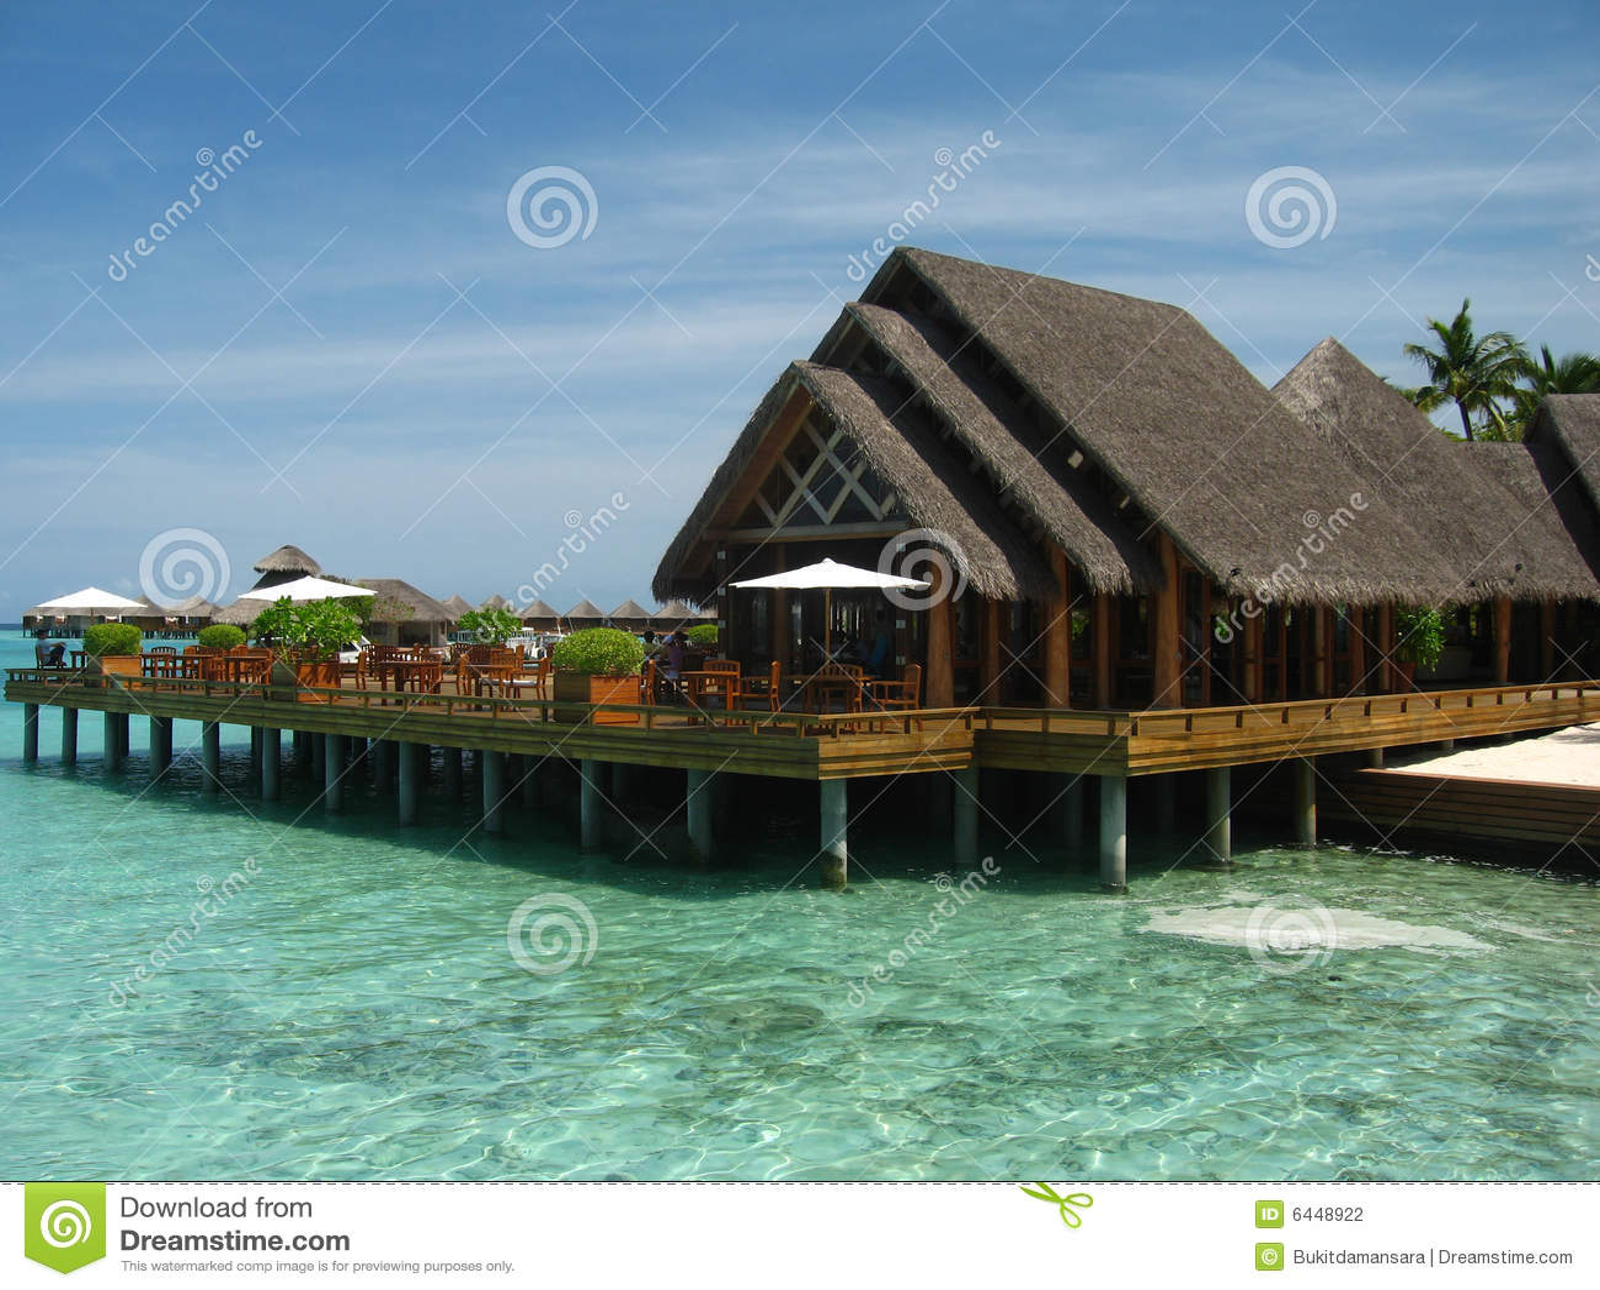 Dreaming Beach House In Maldives